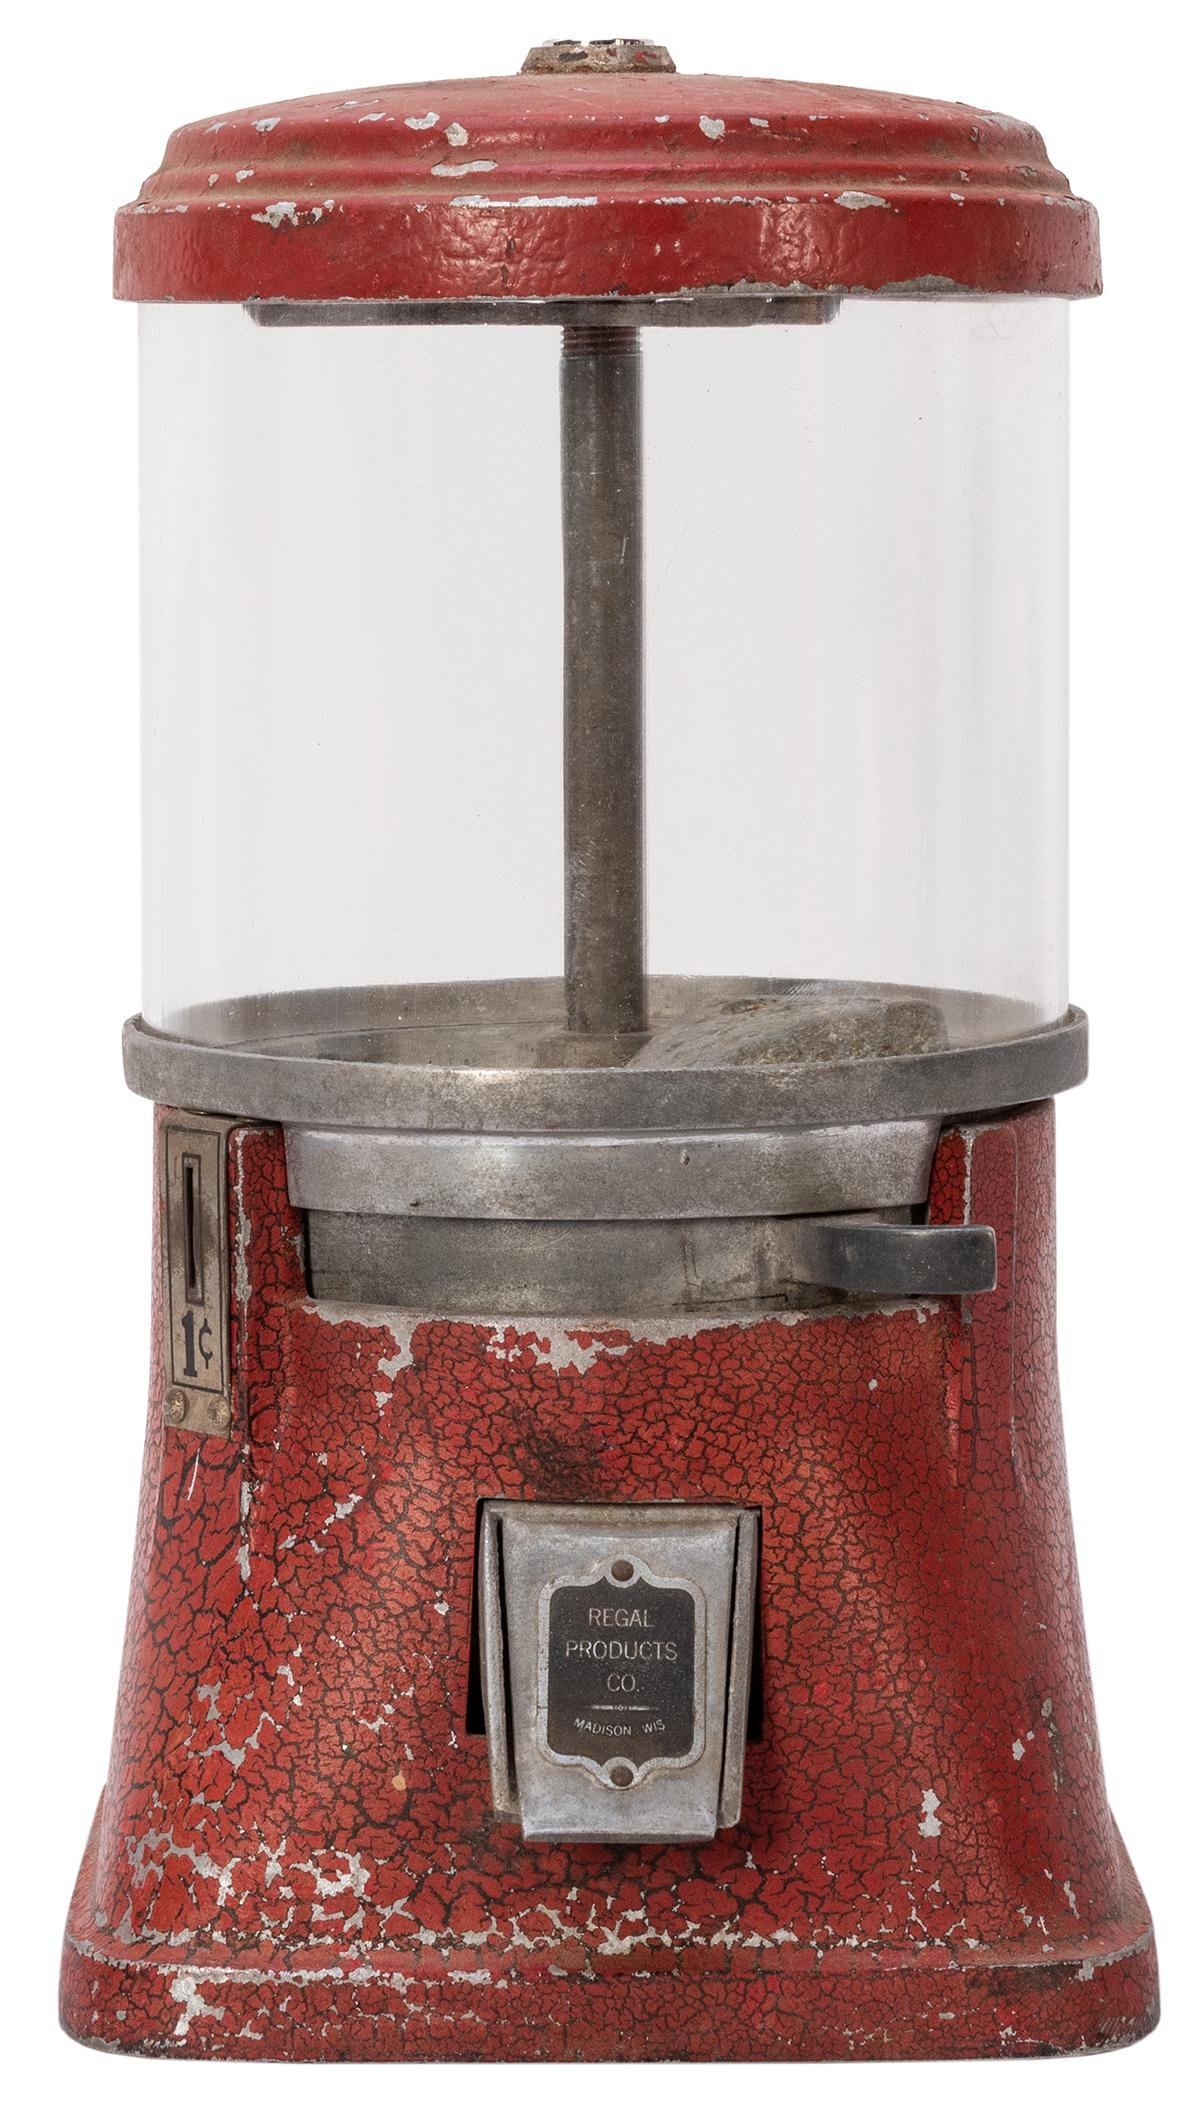 Regal Products 1 Cent Gum Ball Machine. Circa 1930s.